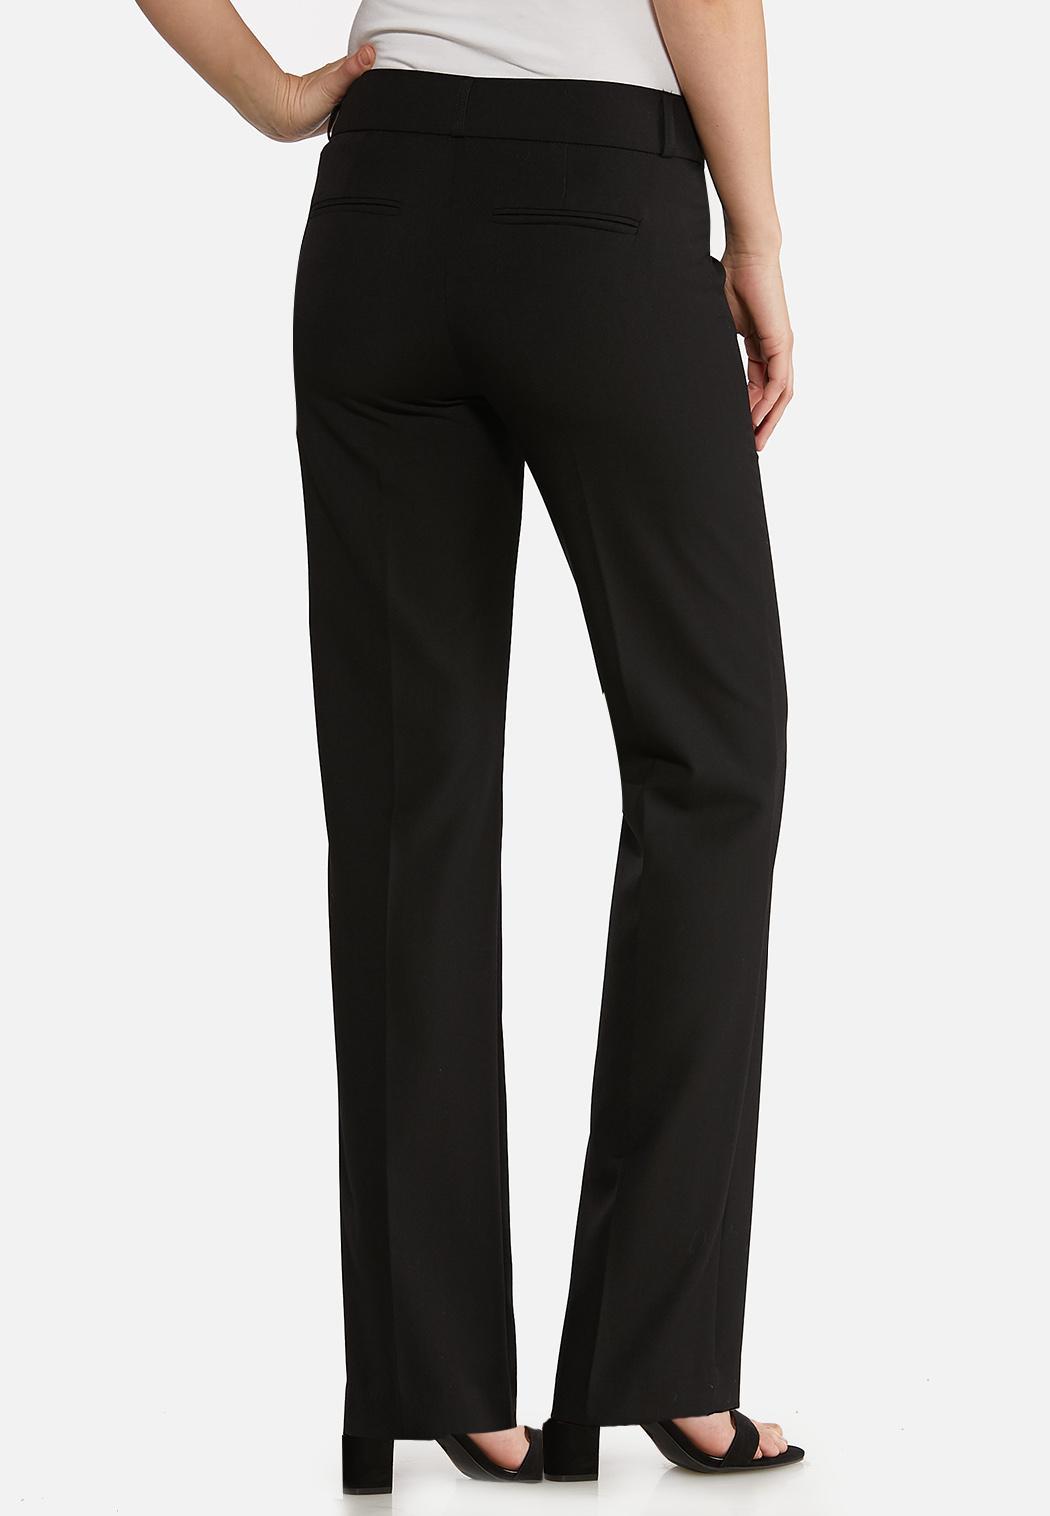 Petite Shape Enhancing Trousers (Item #44108692)